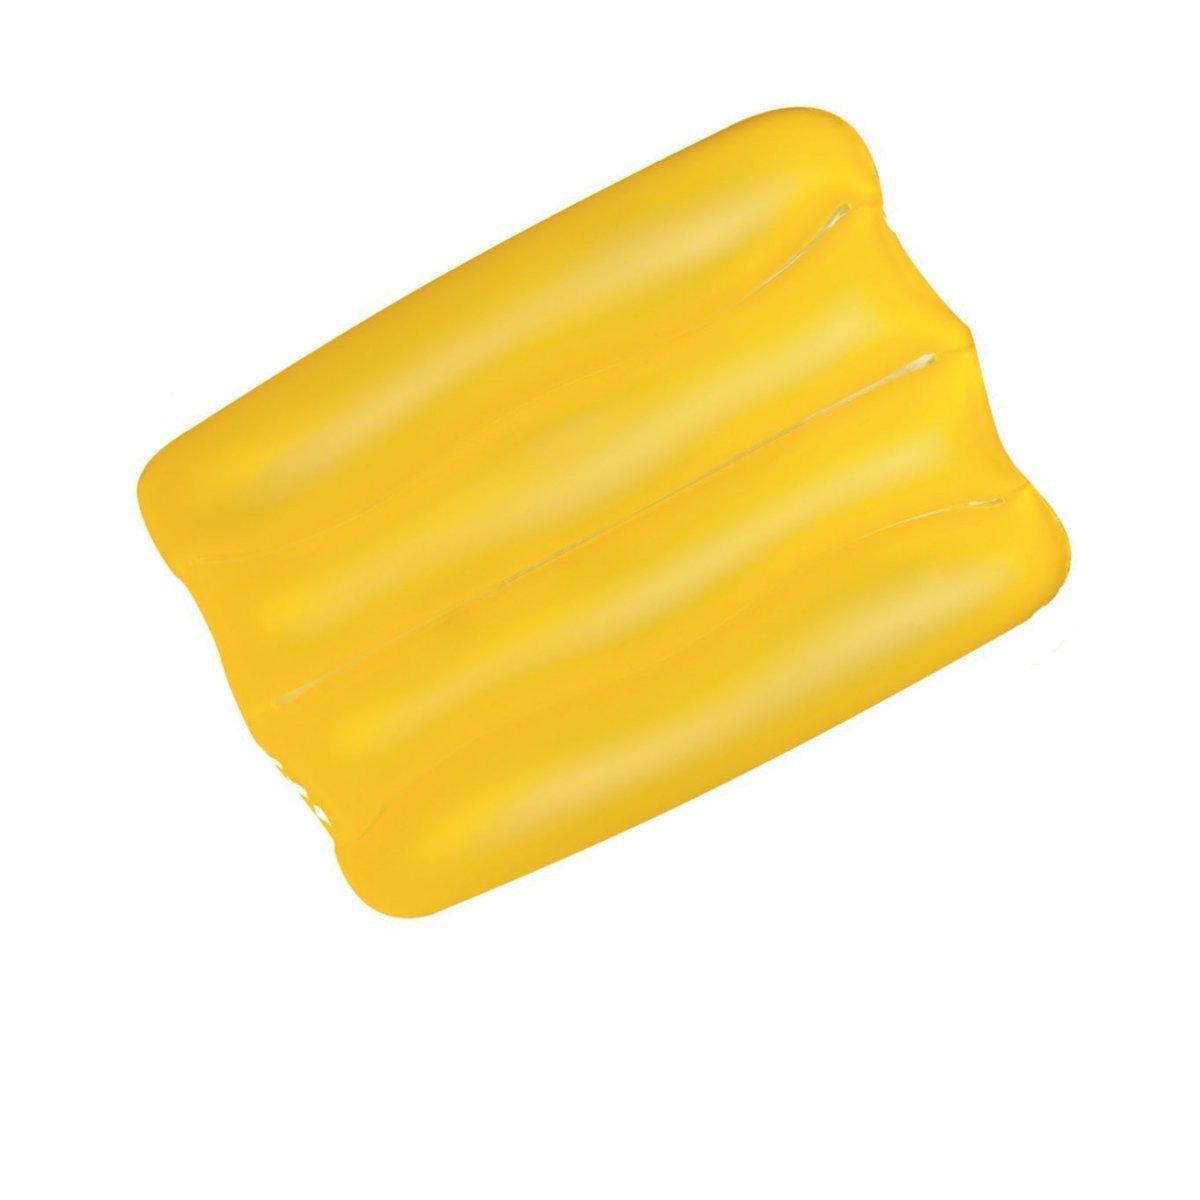 Надувная виниловая подушка Bestway 52127, желтая, 38 х 25 х 5 см